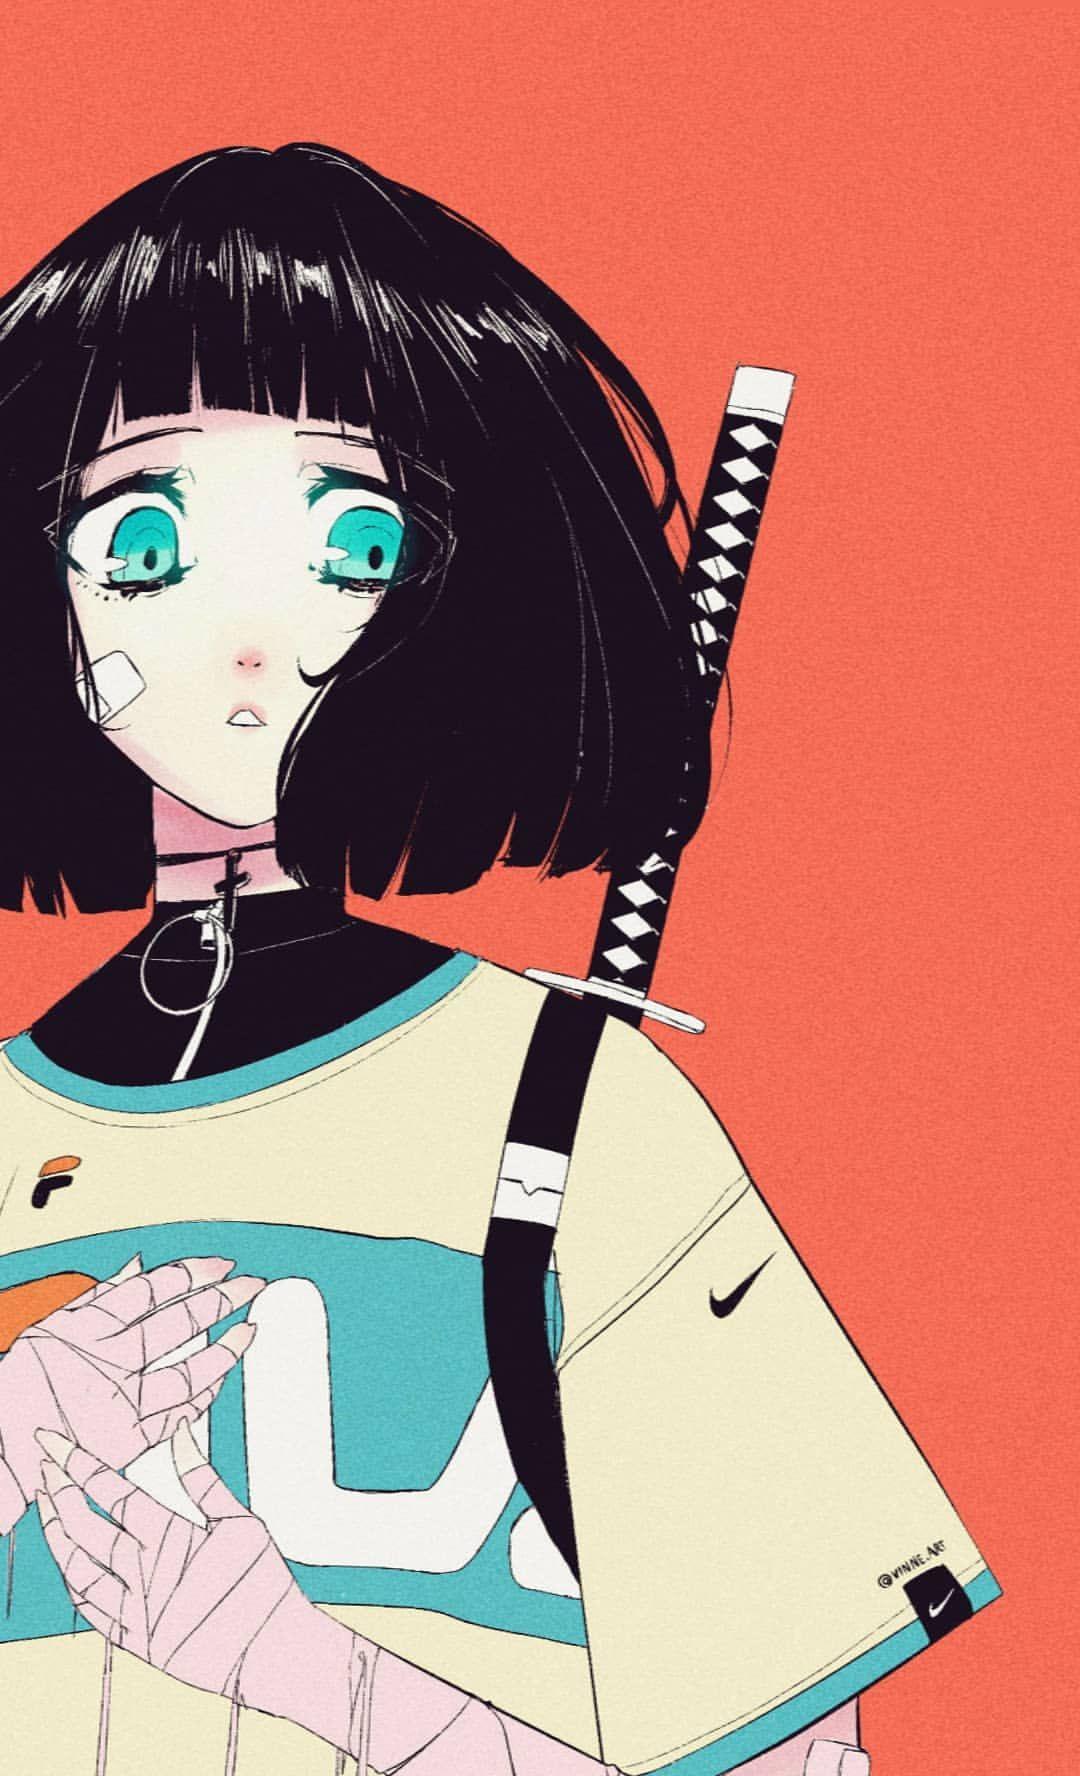 Pin By Ace On Aesthetics Anime Art Girl Japanese Art Anime Art